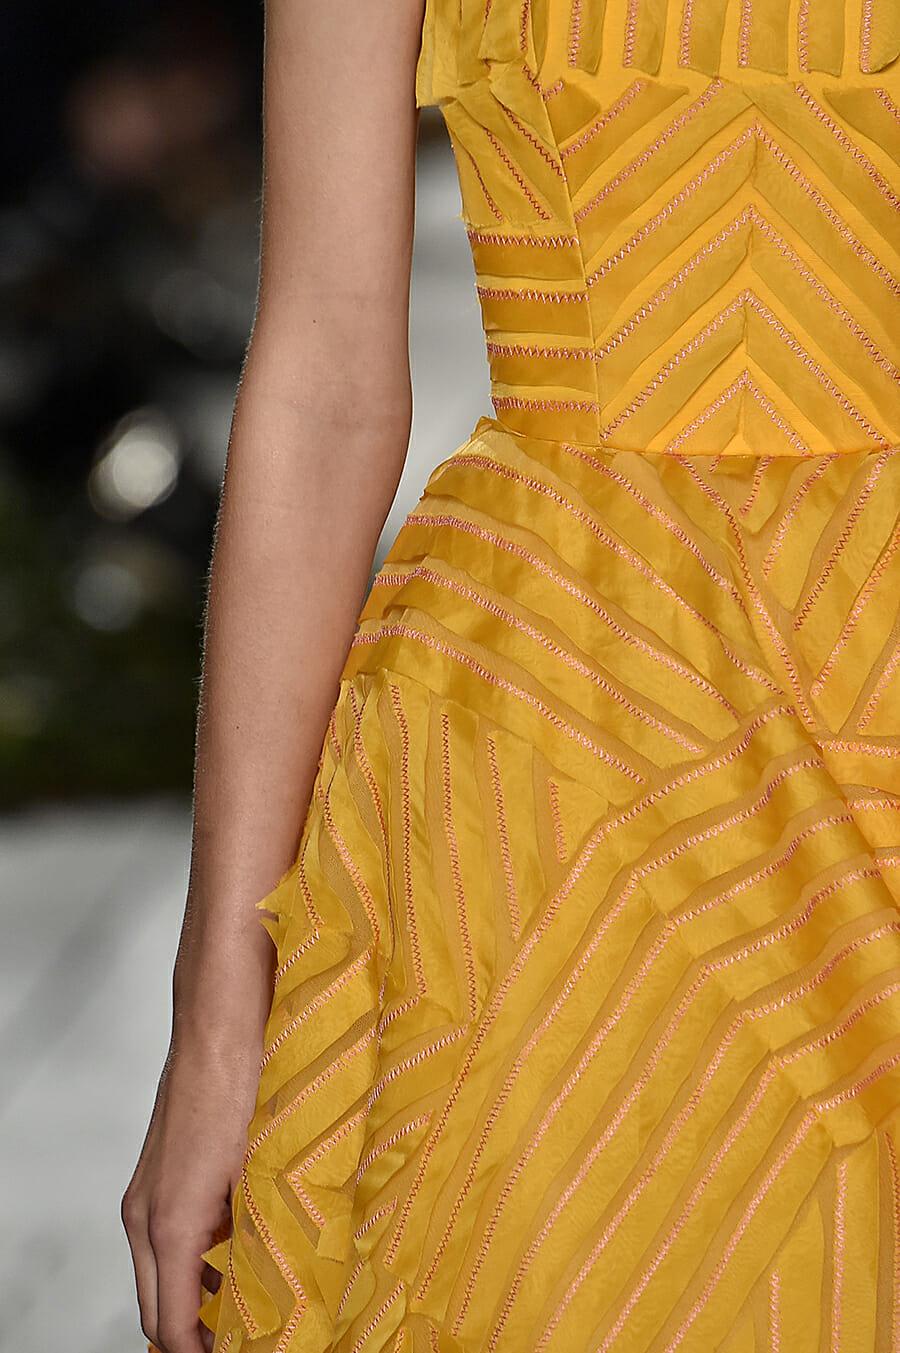 Carolina-Herrera-New-York-Fashion-Week-Spring-Summer-2018-NY-September-2017-look44-detail2